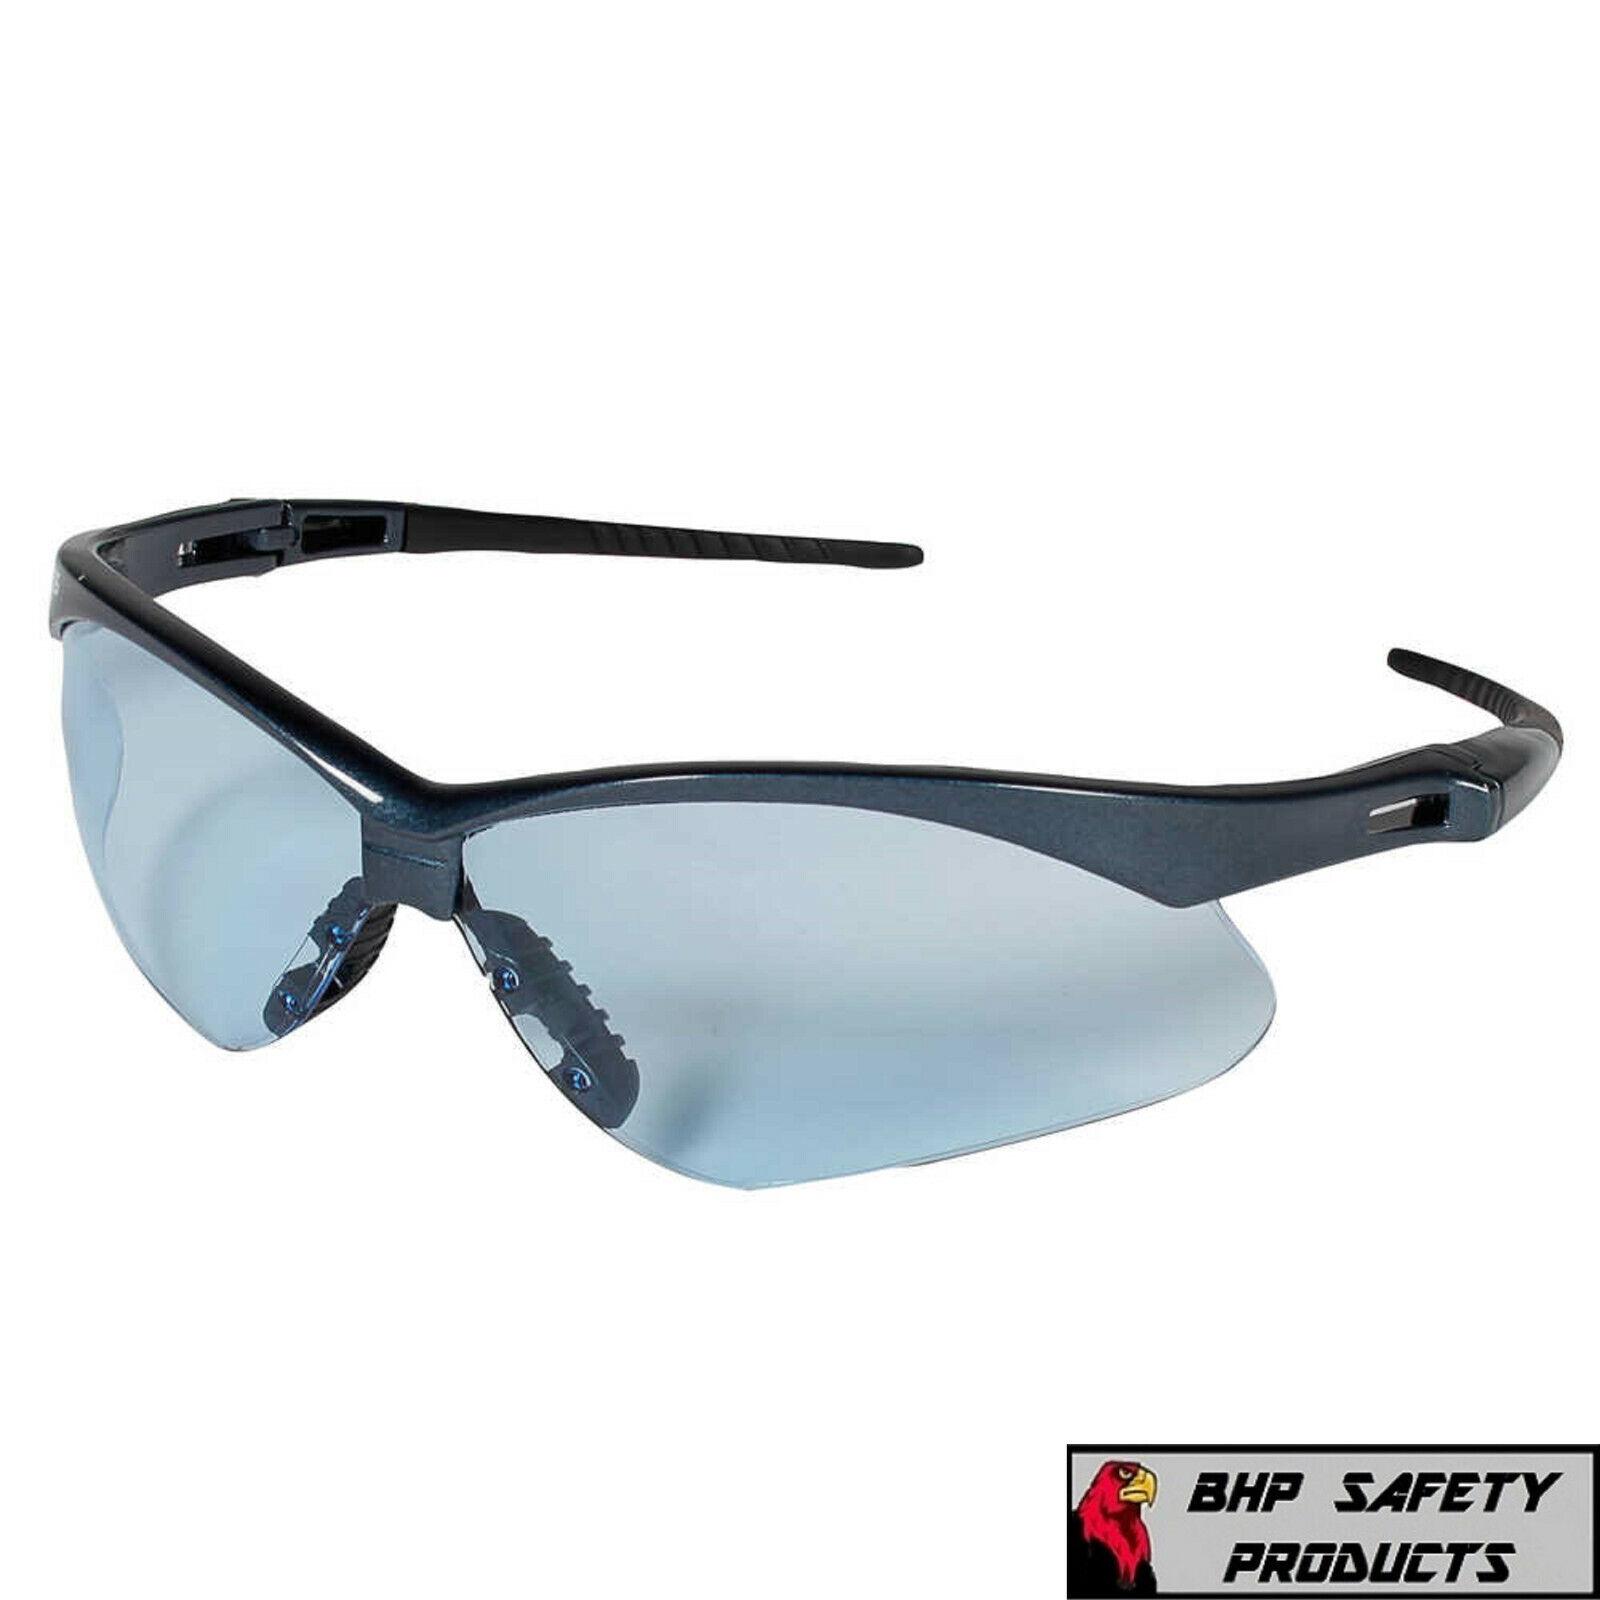 JACKSON NEMESIS SAFETY GLASSES SUNGLASSES SPORT WORK EYEWEAR ANSI Z87 COMPLIANT 19639-Blue Frame/Light Blue Lens